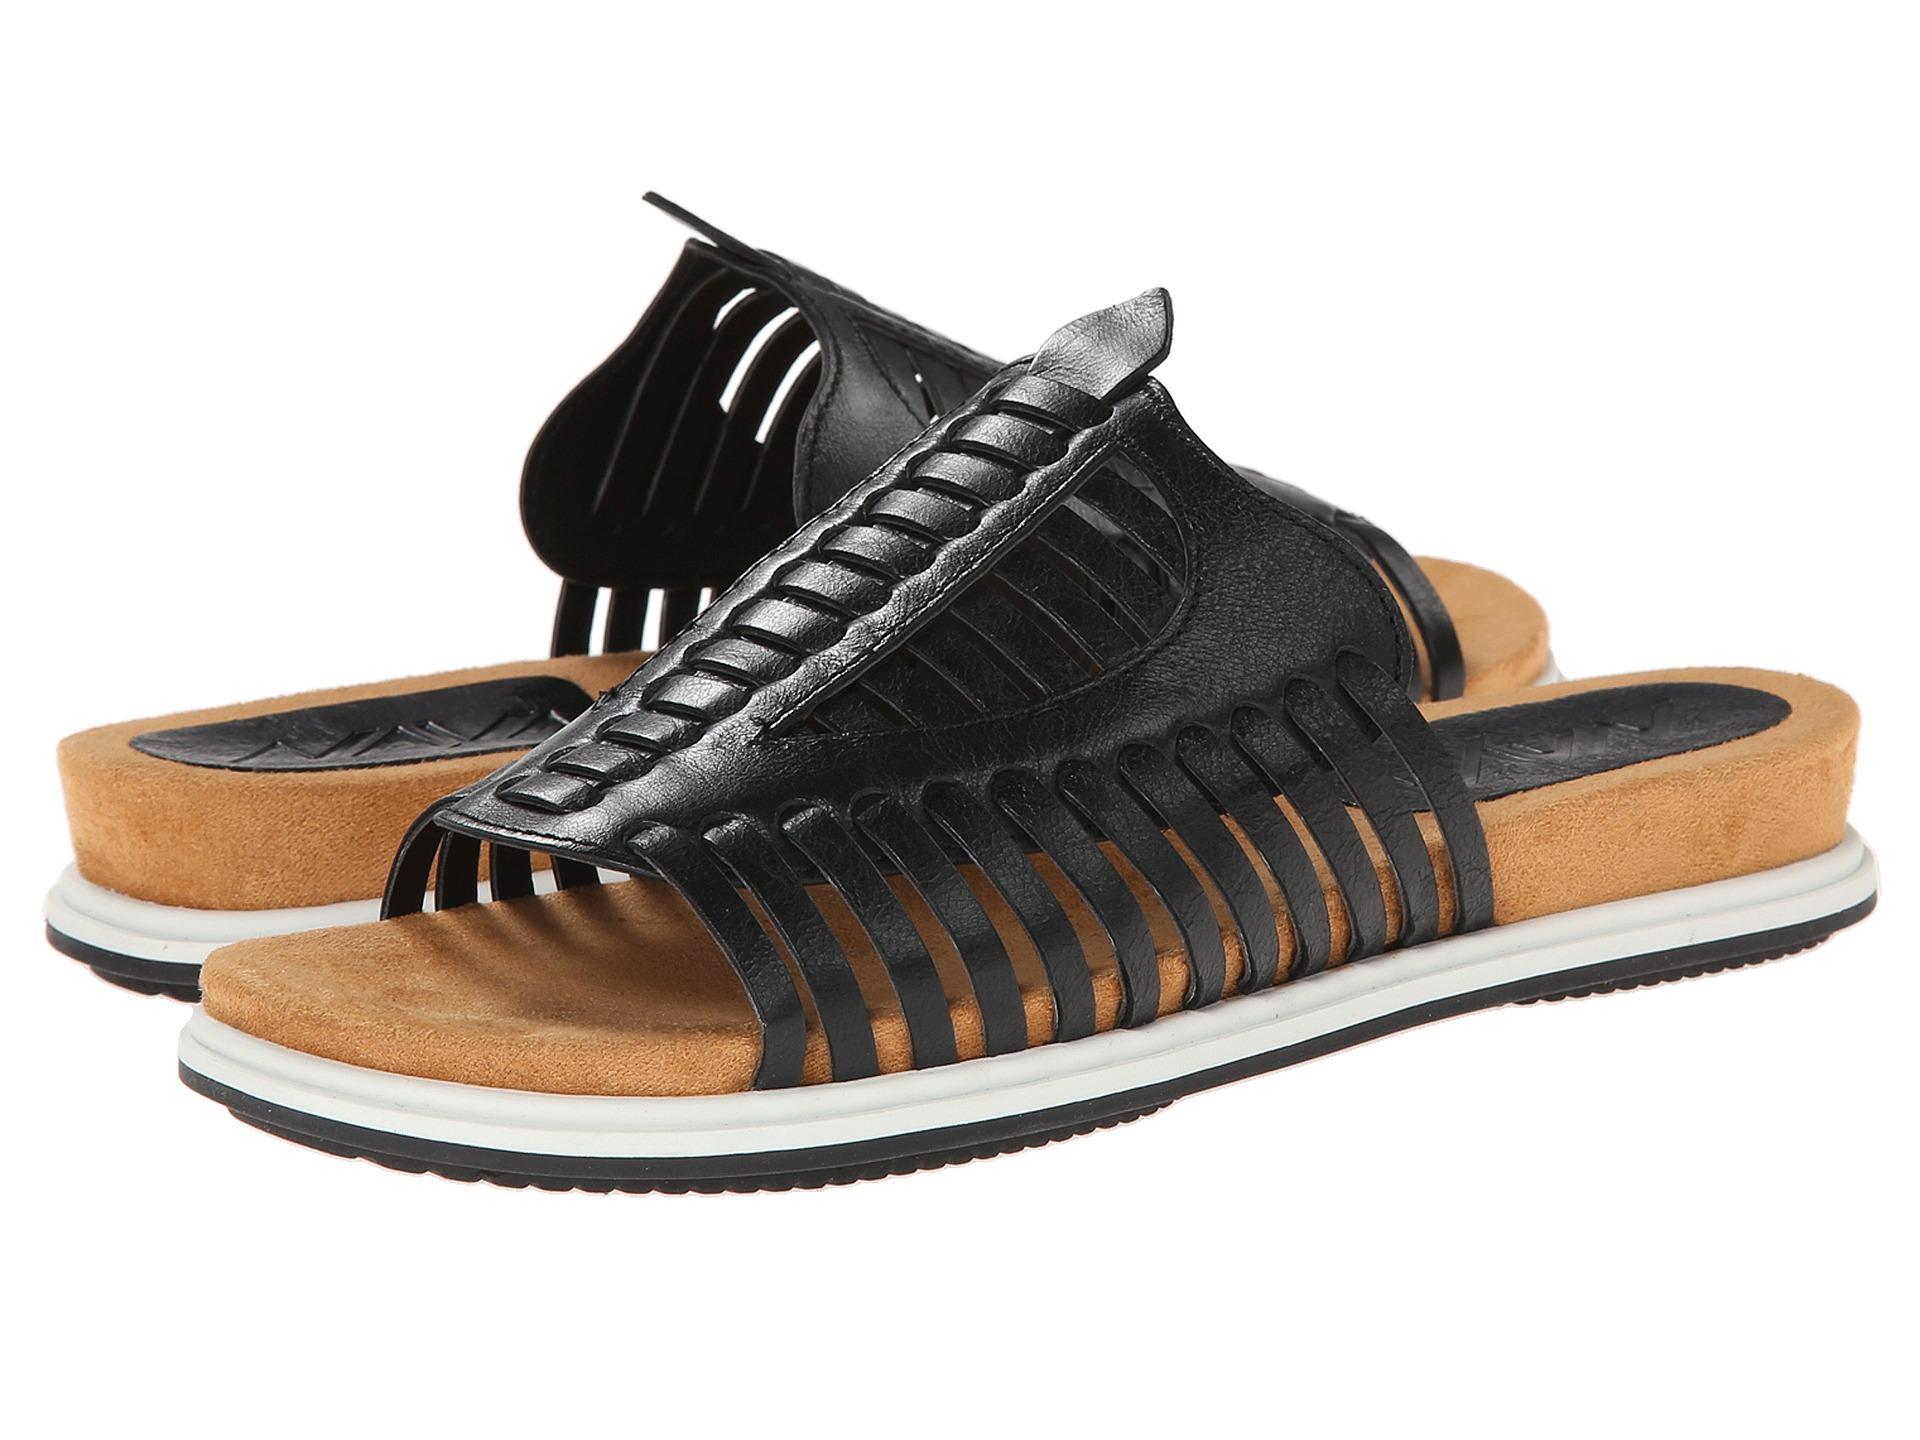 Black kicker sandals - Black Kicker Sandals 35